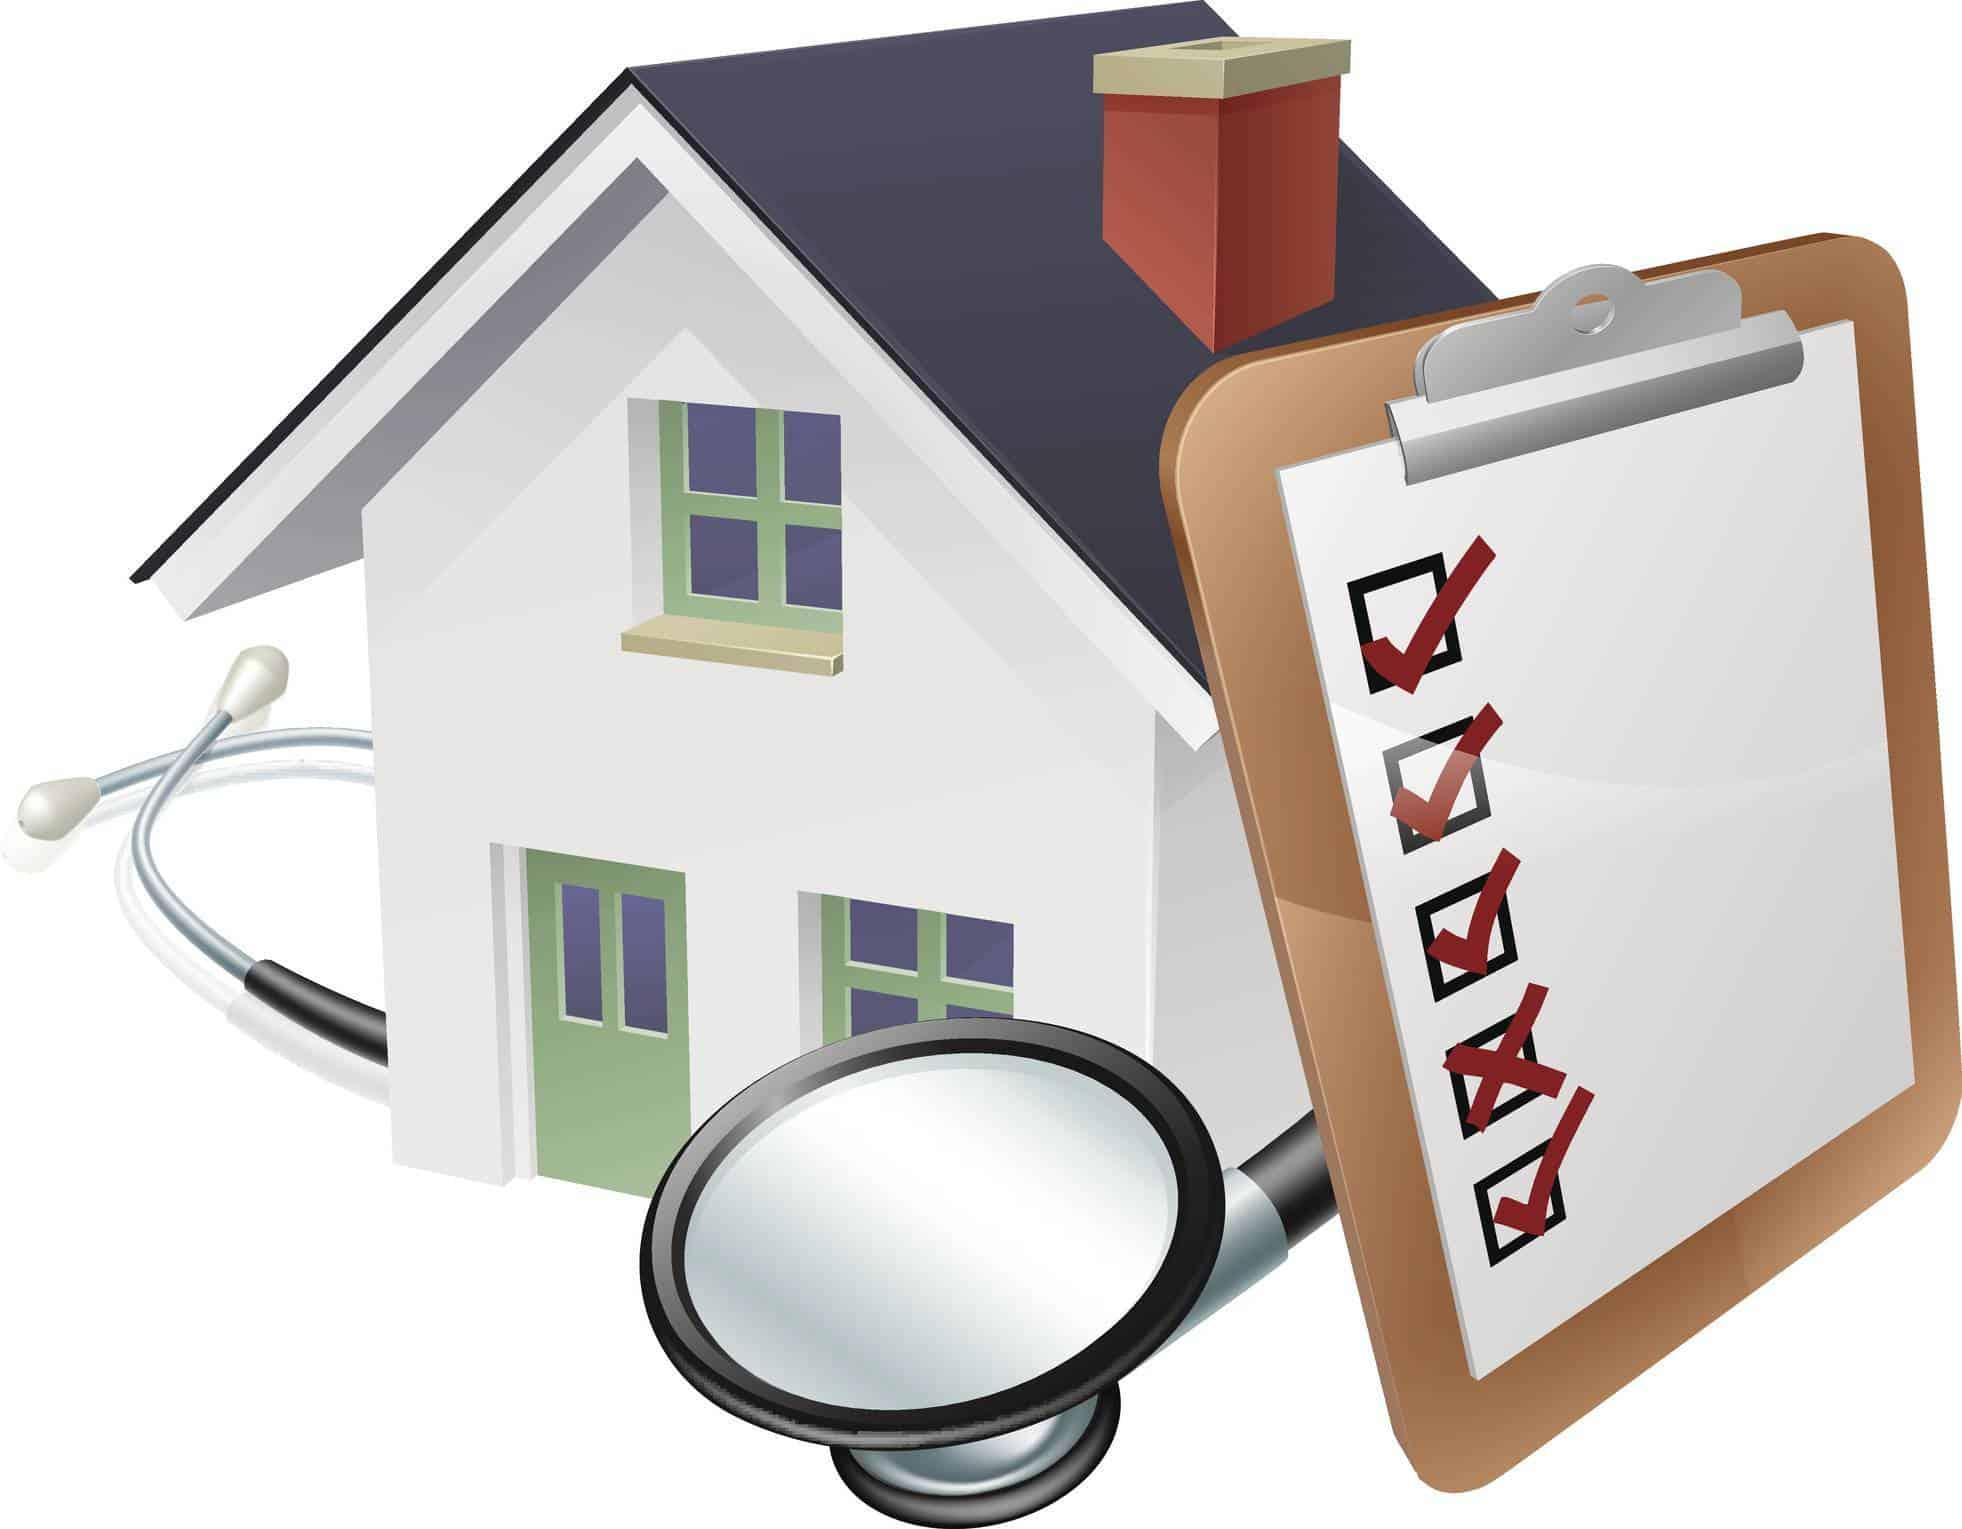 Diagnostic immobillier